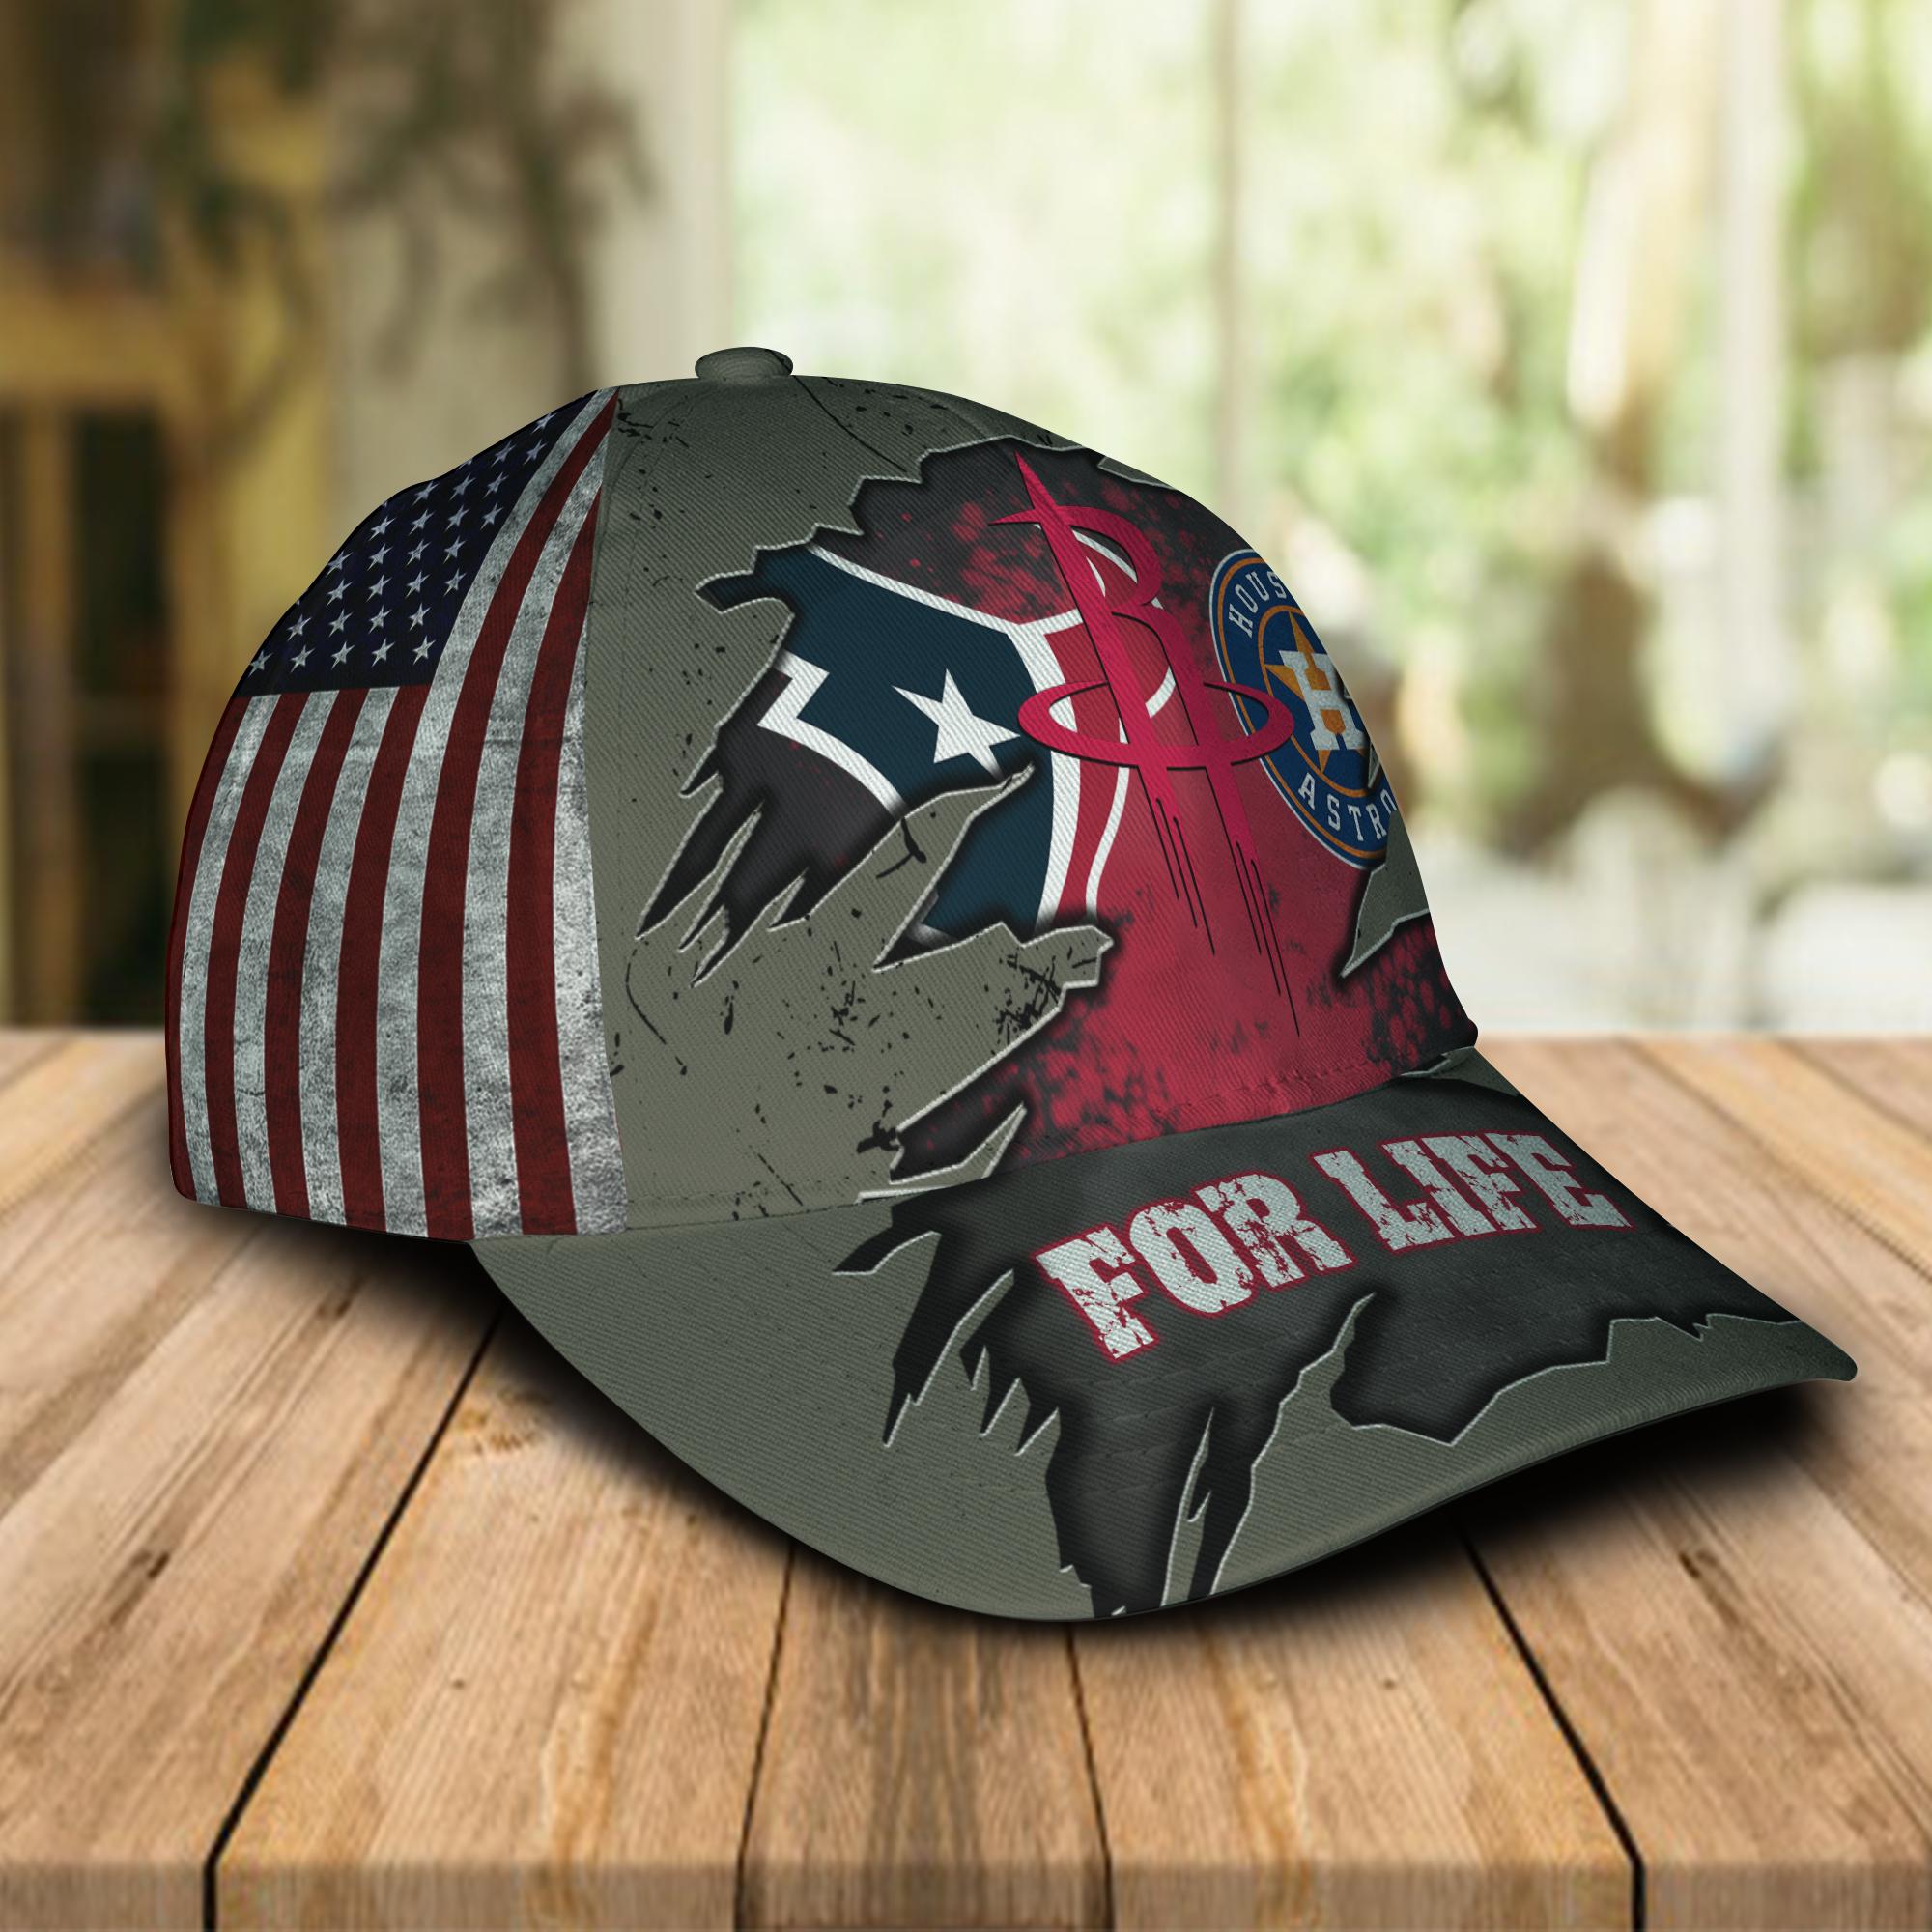 Houston Texans, Houston Astros, Houston Rockets For Life Hat Cap-1